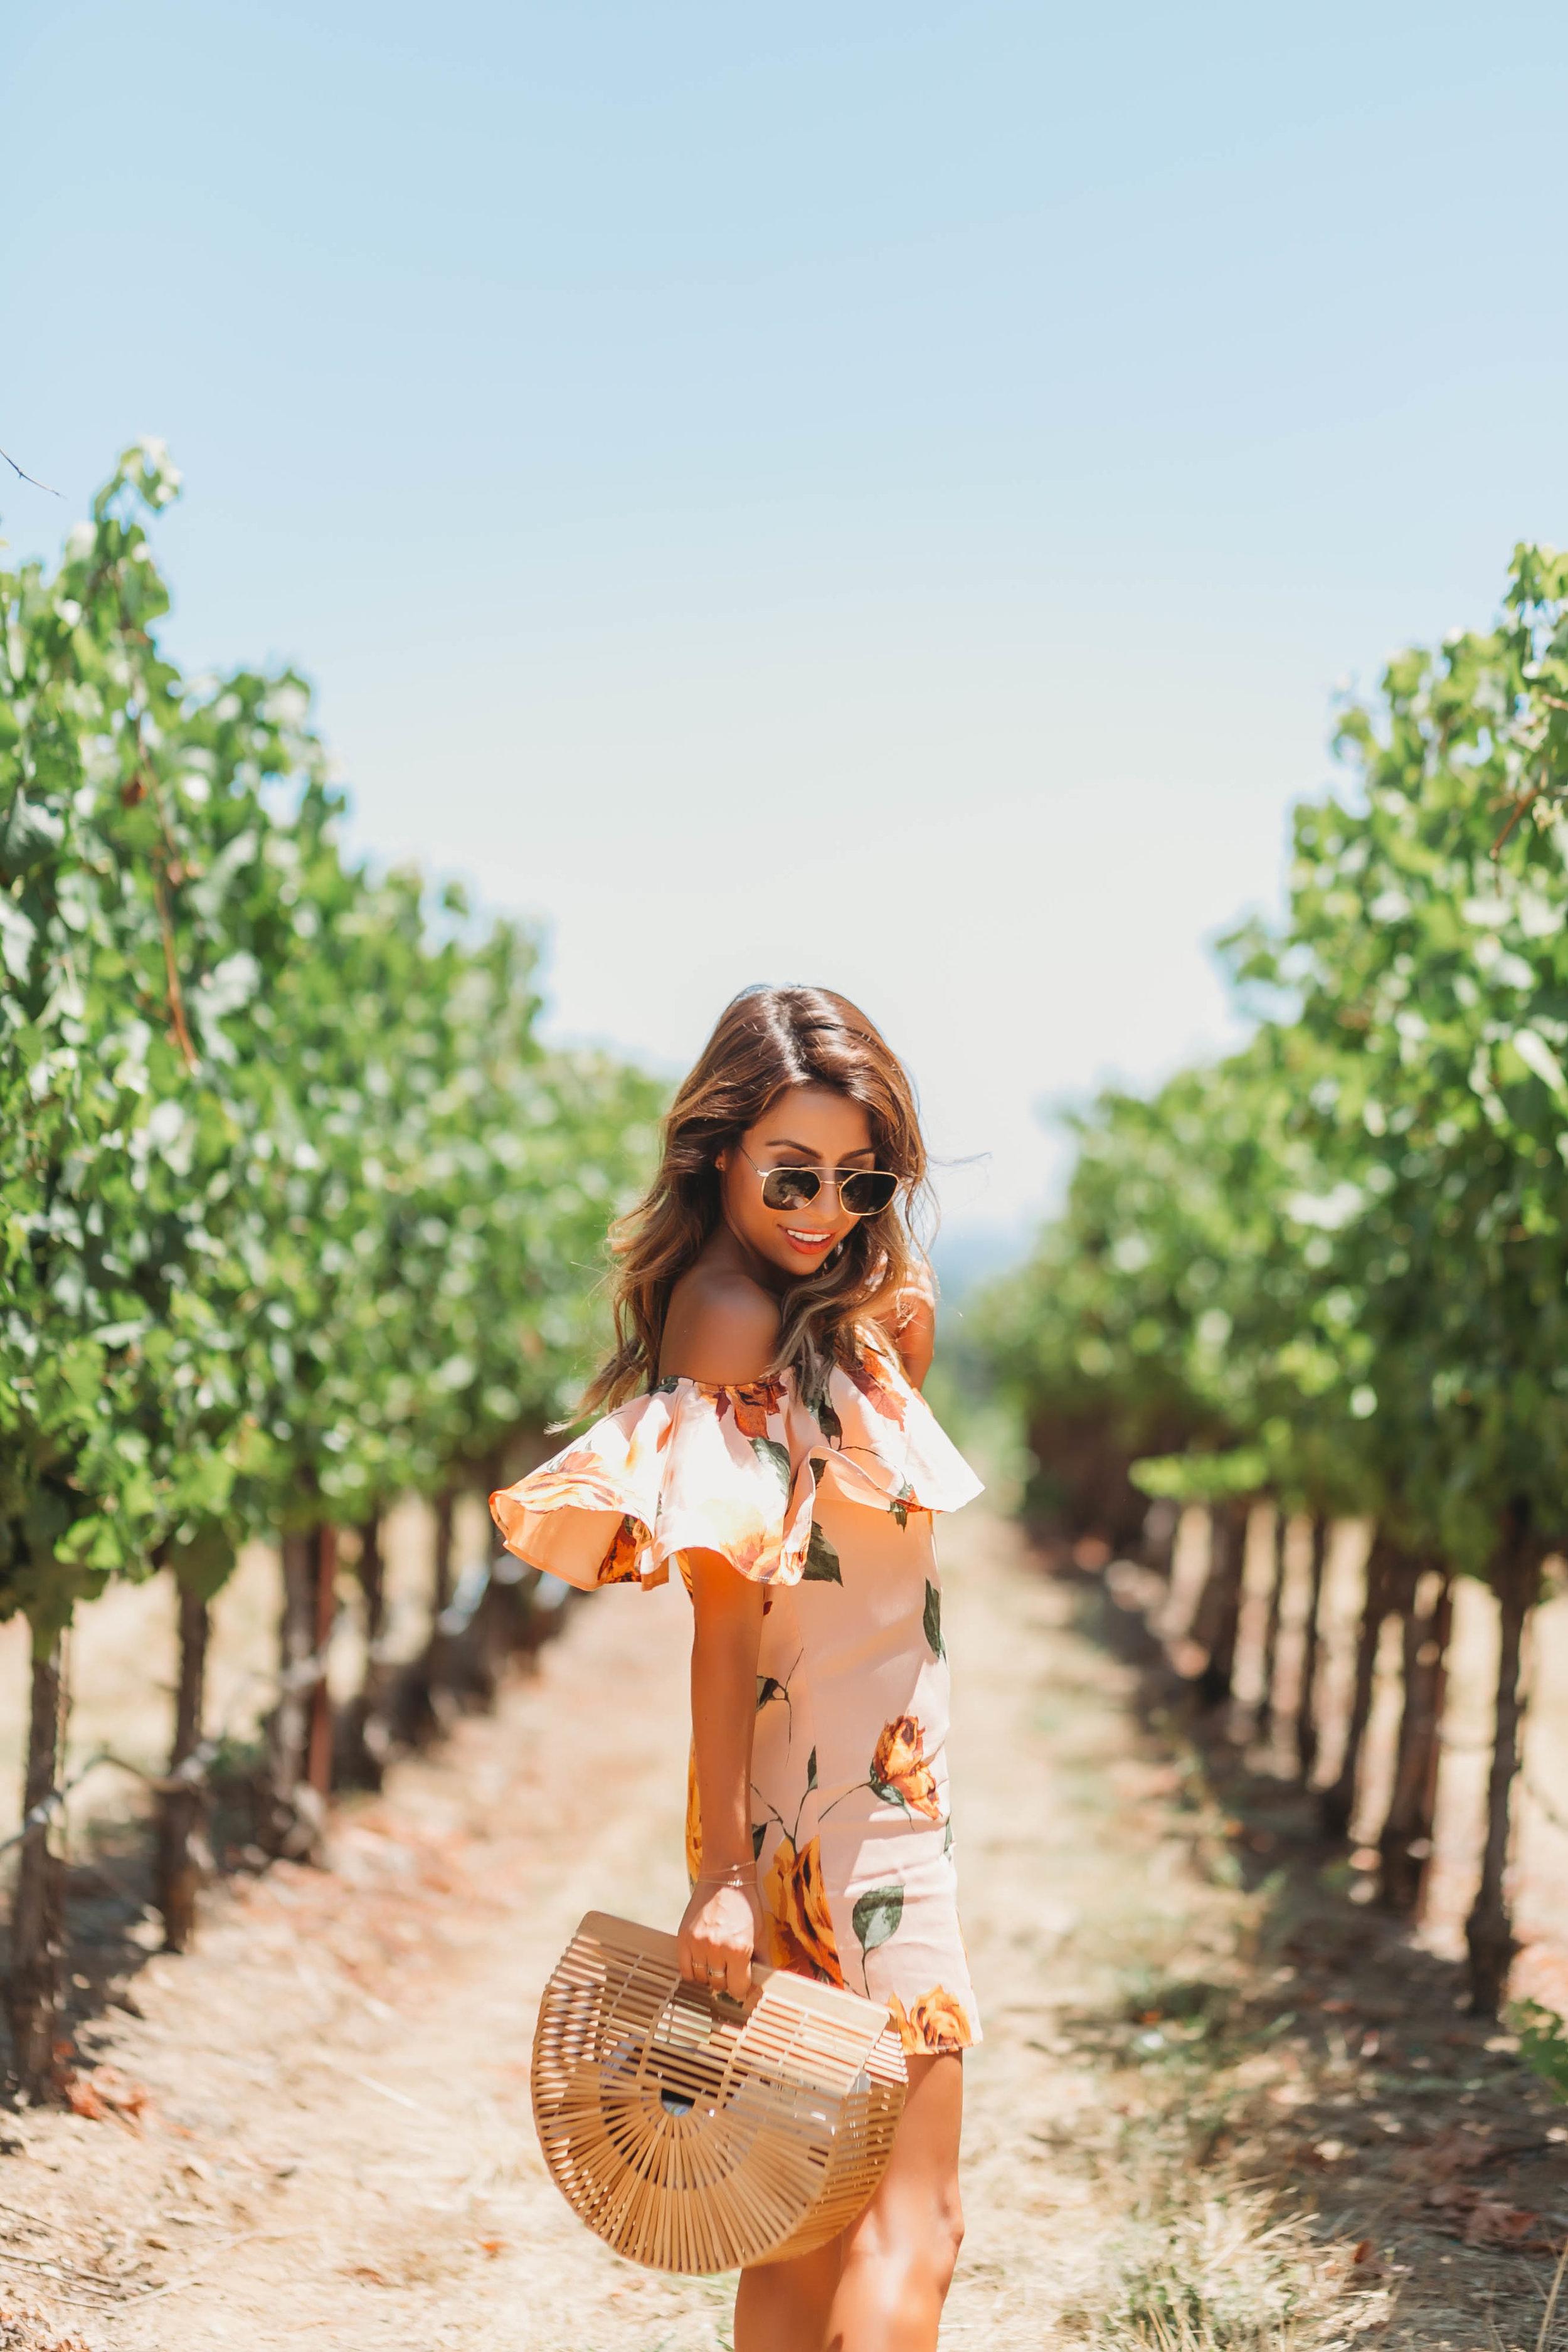 Everyday Pursuits Wine Tasting in Sonoma, Cult Gaia Bag, Stylist LA dress